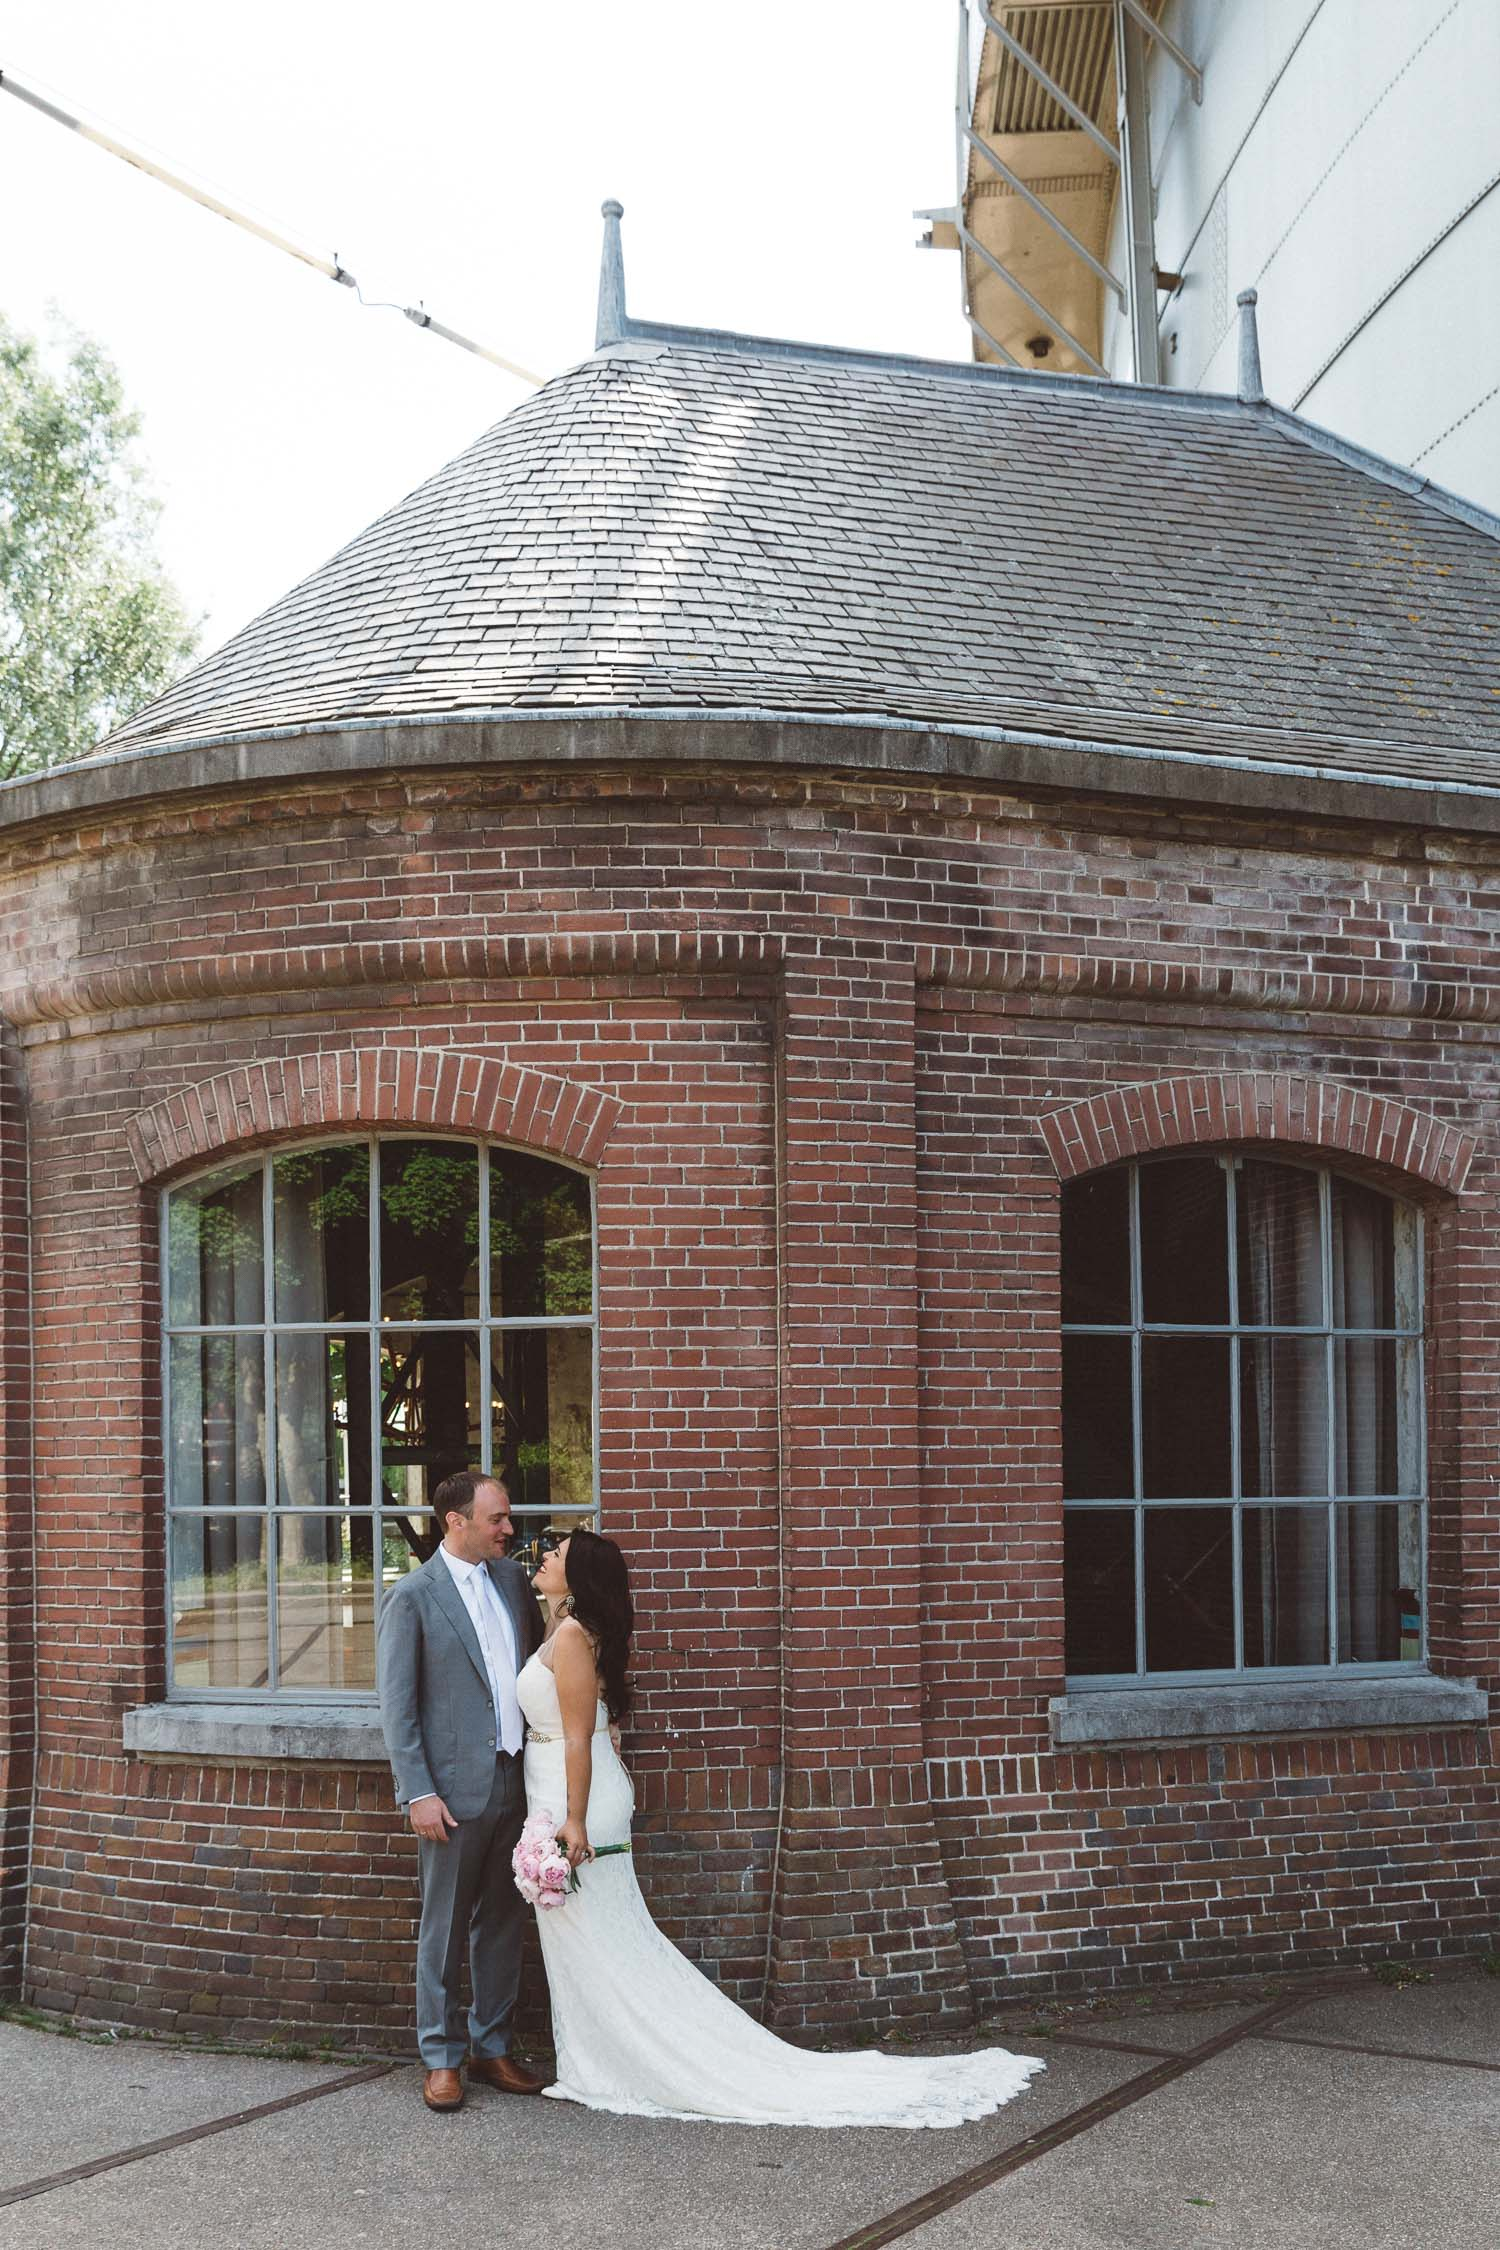 Wedding-Francesca-and-Nathan-photography-On-a-hazy-morning-Amsterdam157.jpg